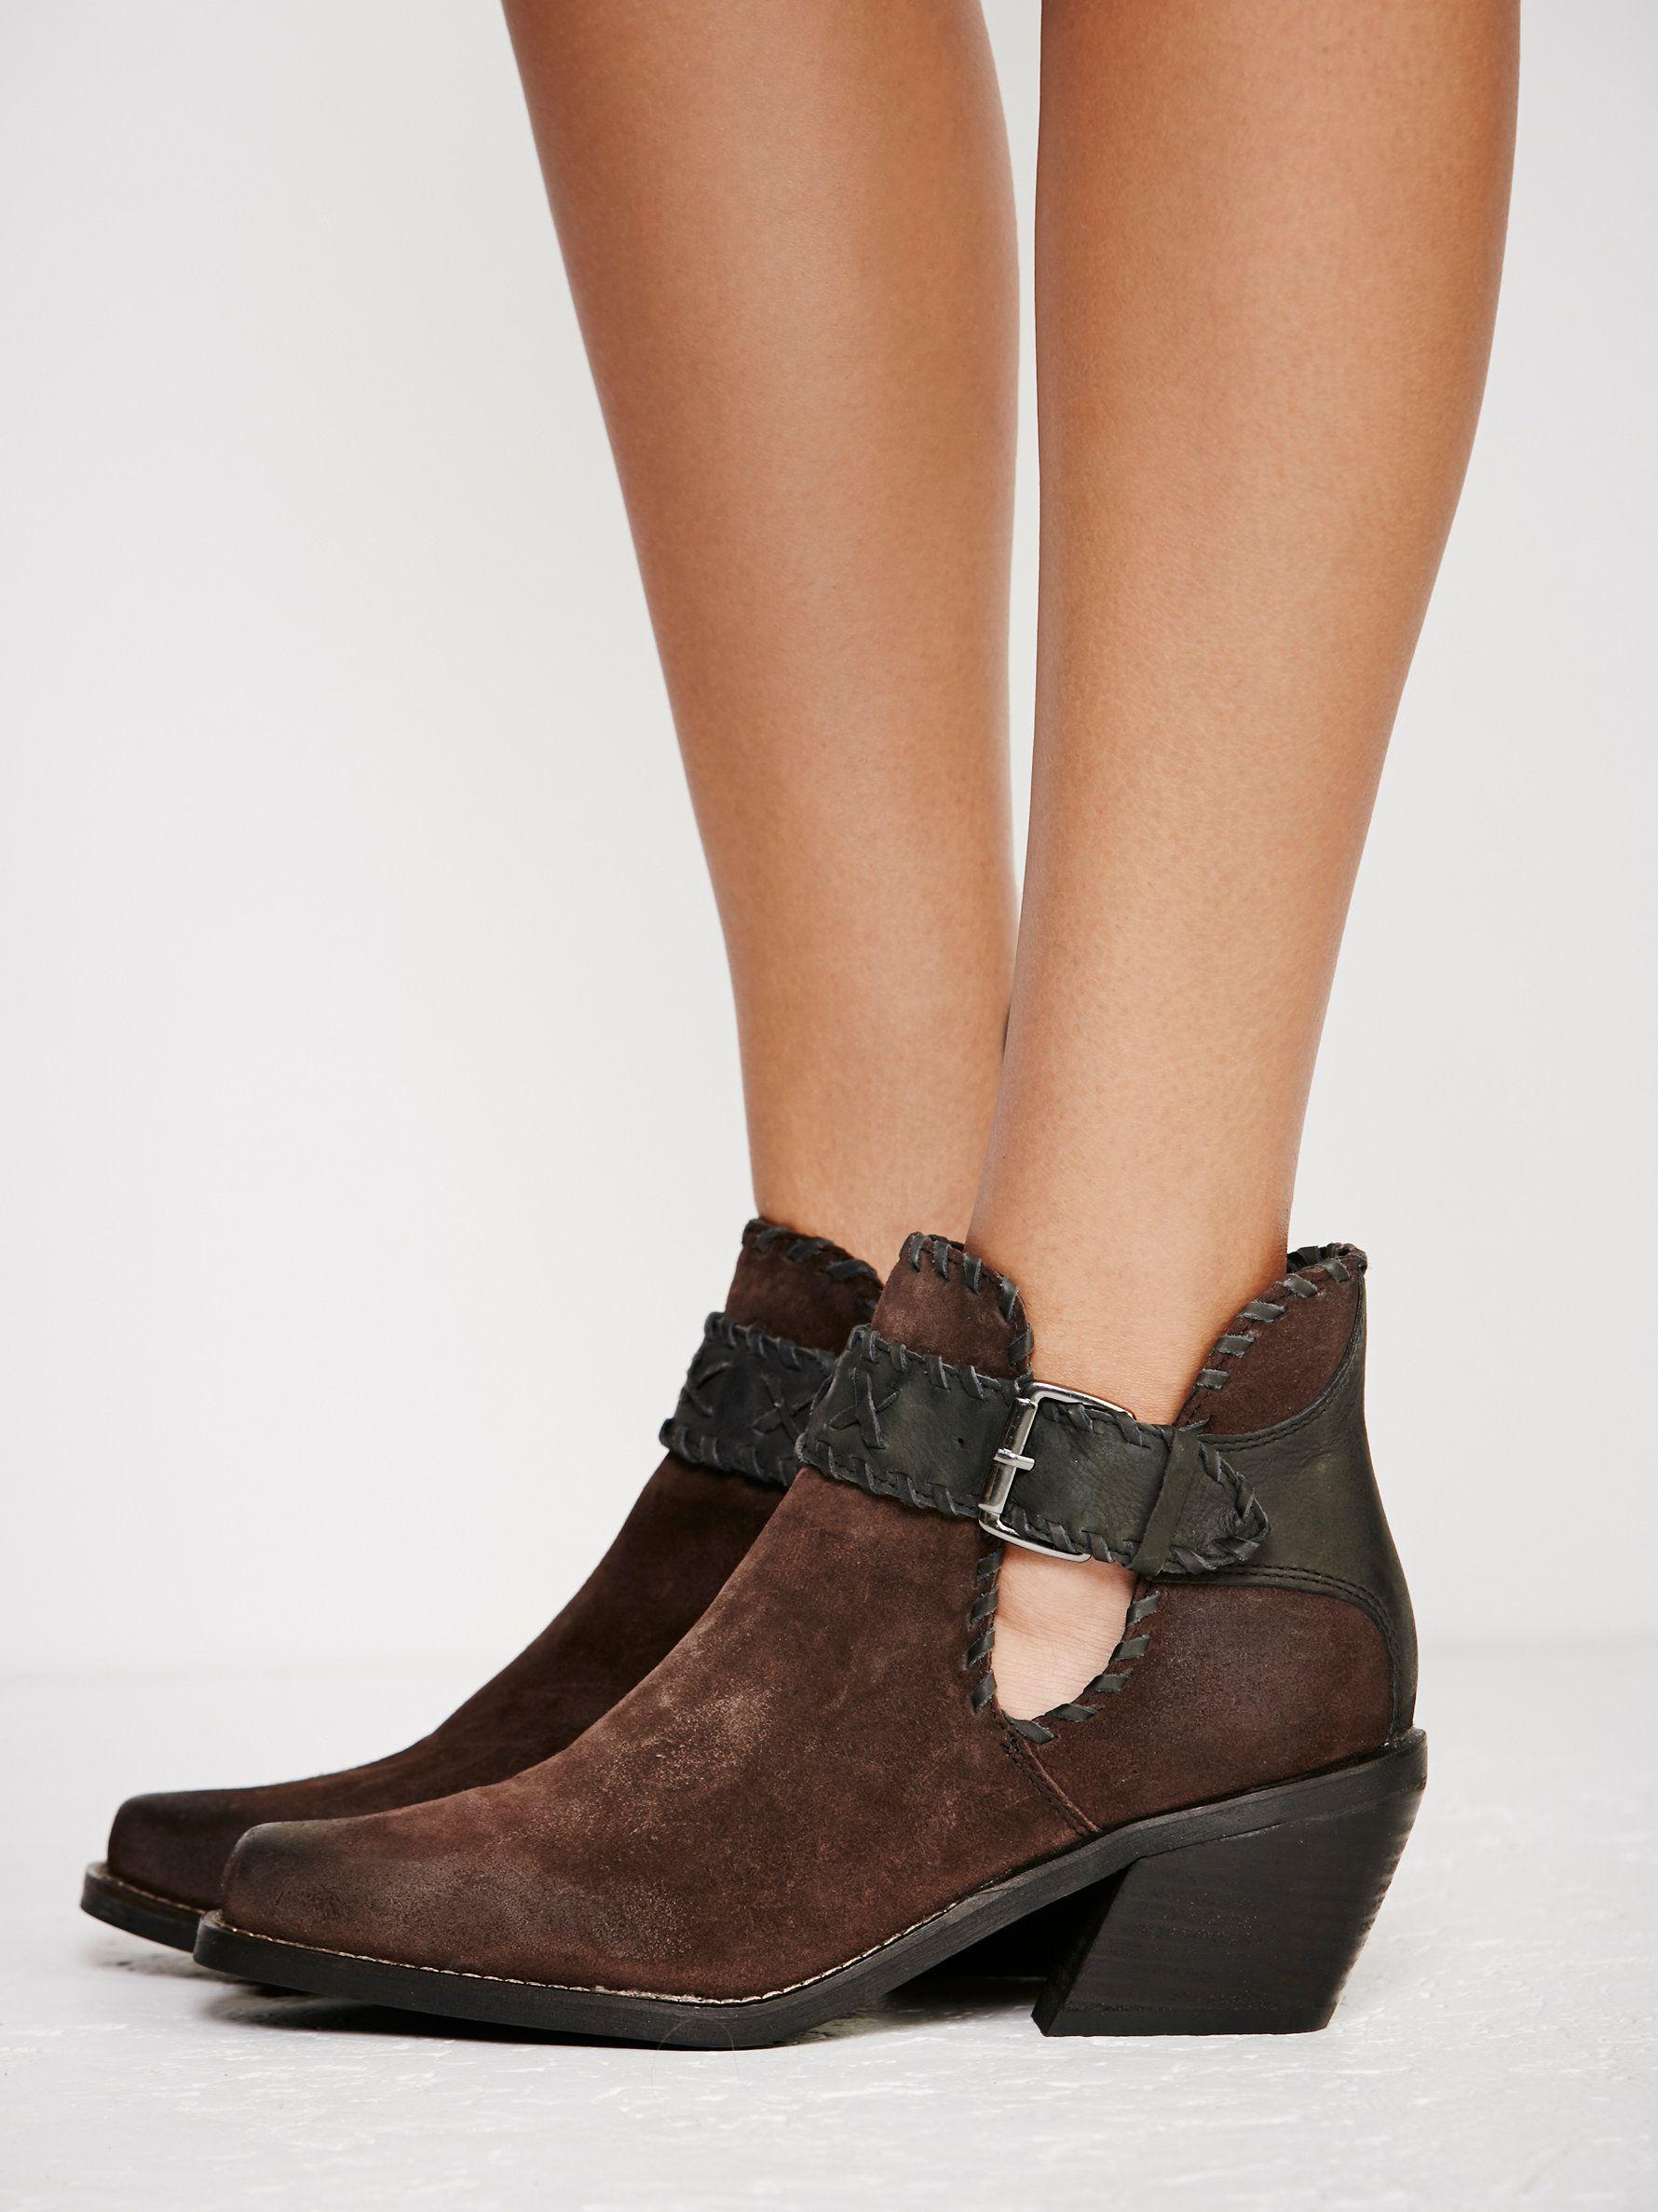 shop c booties shoes walk black comfortable white walking women skechers for brands performance go comforter p best